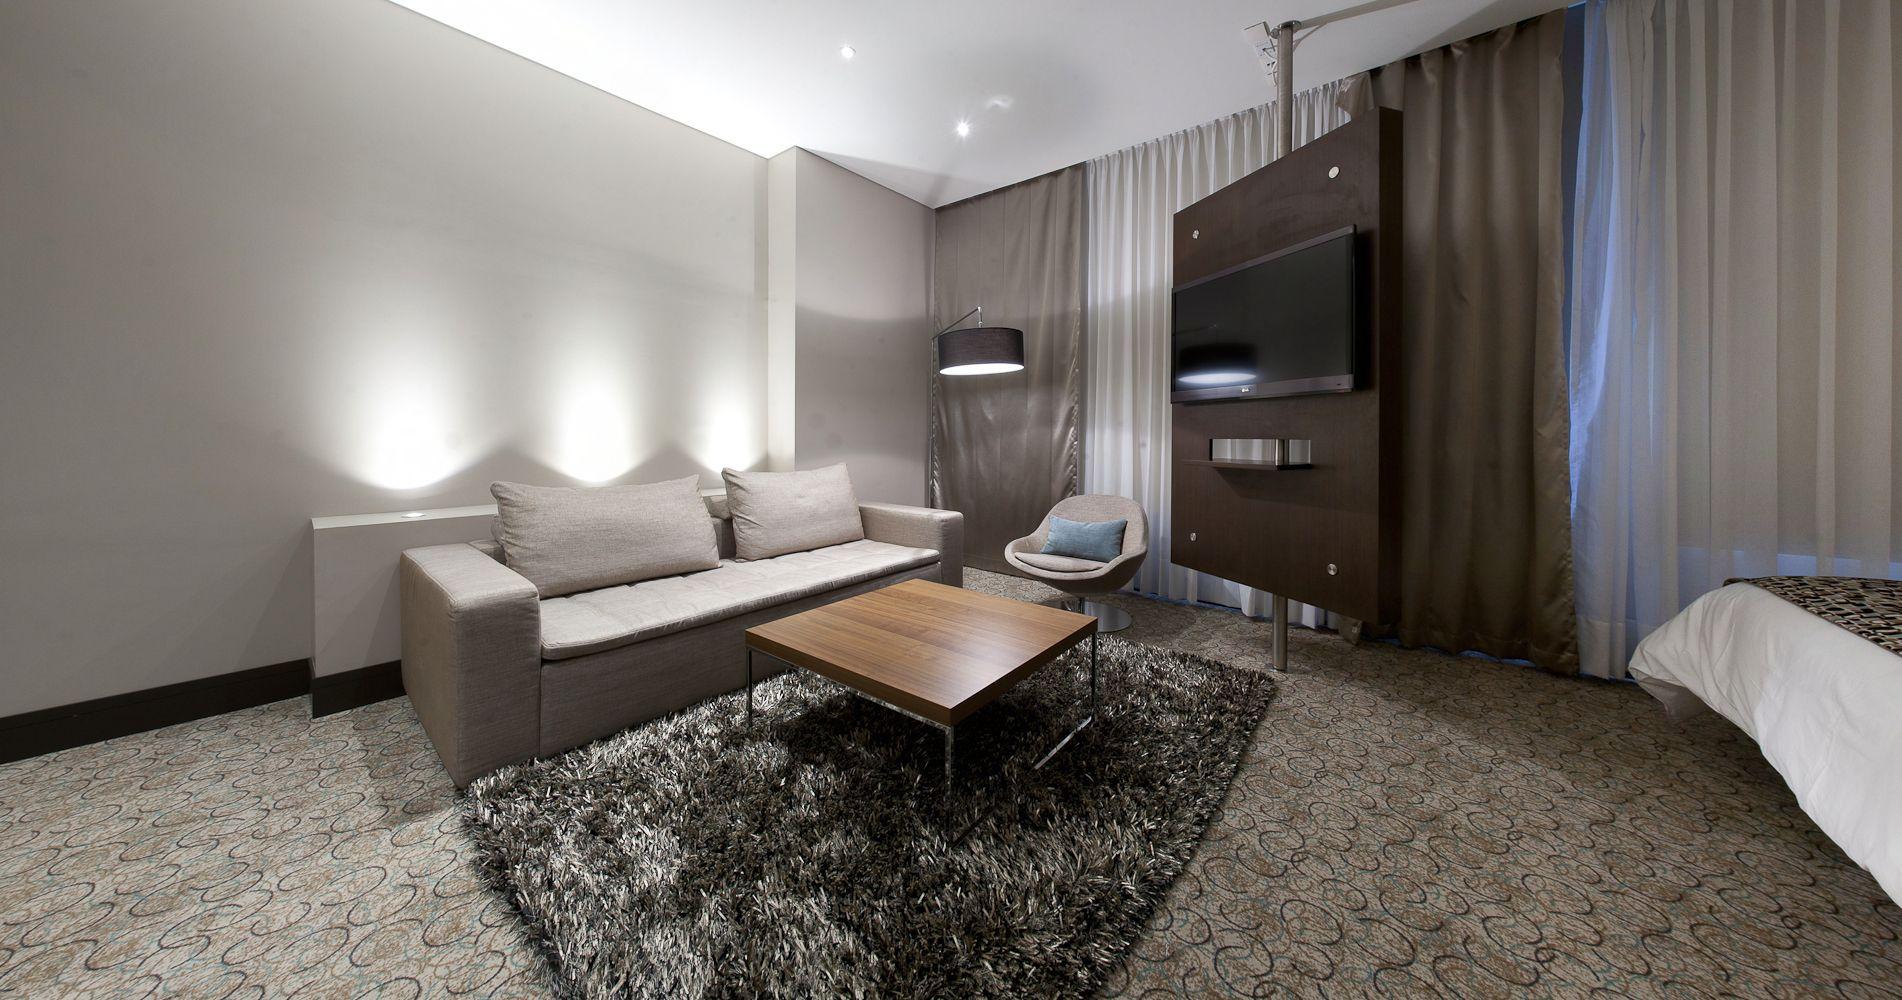 boconcept mezzo sofa veneto chair lugo coffee table and. Black Bedroom Furniture Sets. Home Design Ideas